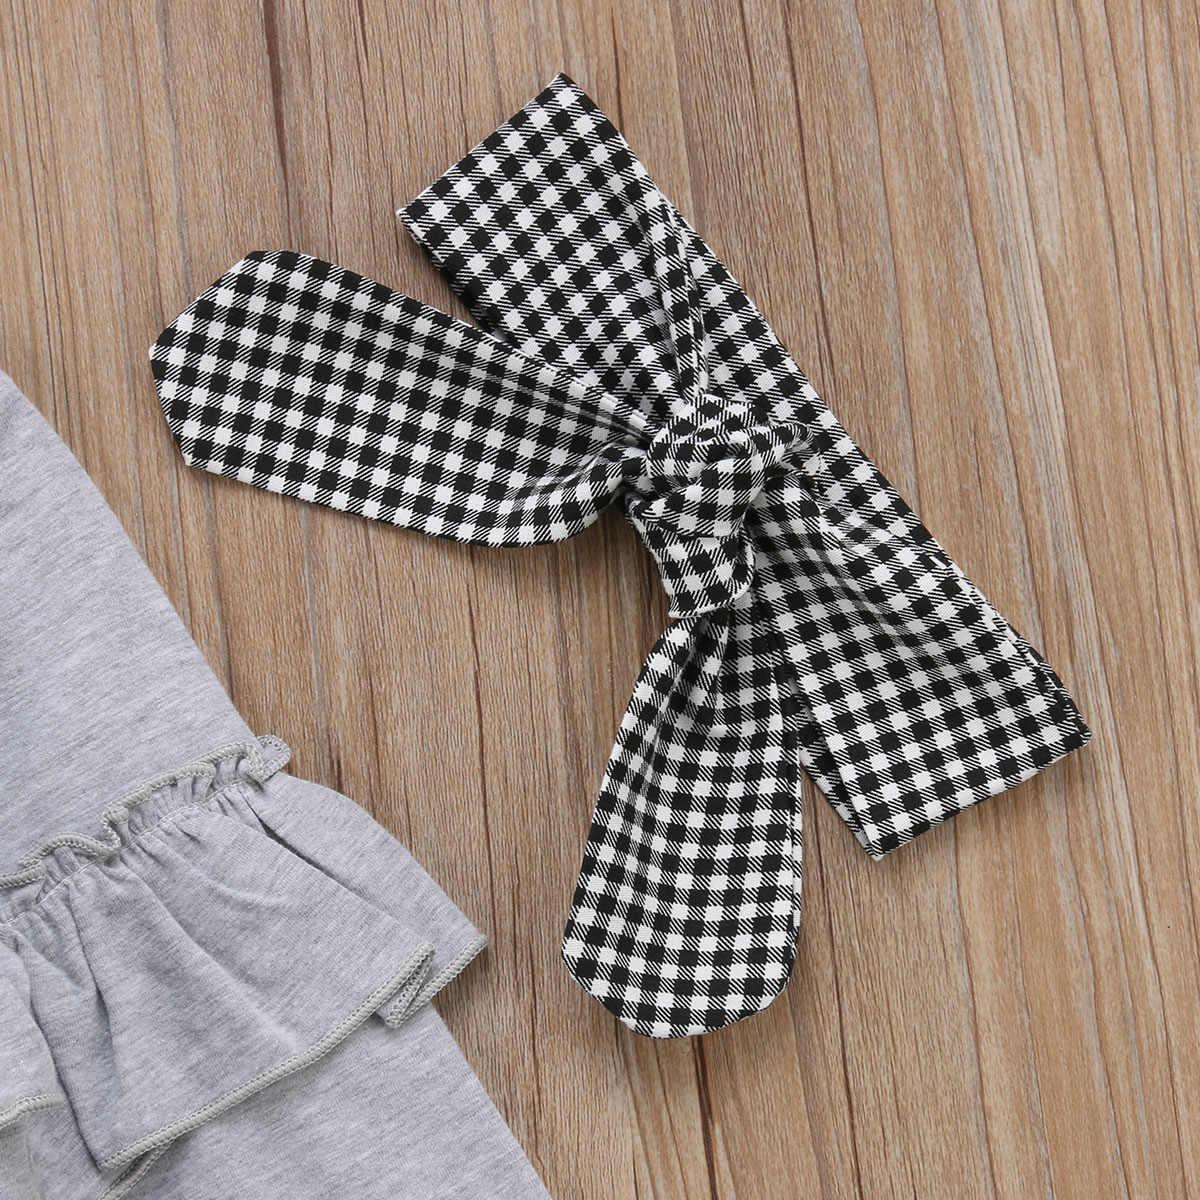 956c9354a924c ... Toddler Kids Baby Girl Outfits 3PCS Ruffle Long Sleeve Tops+Plaid Pants  Leggings+Headband ...